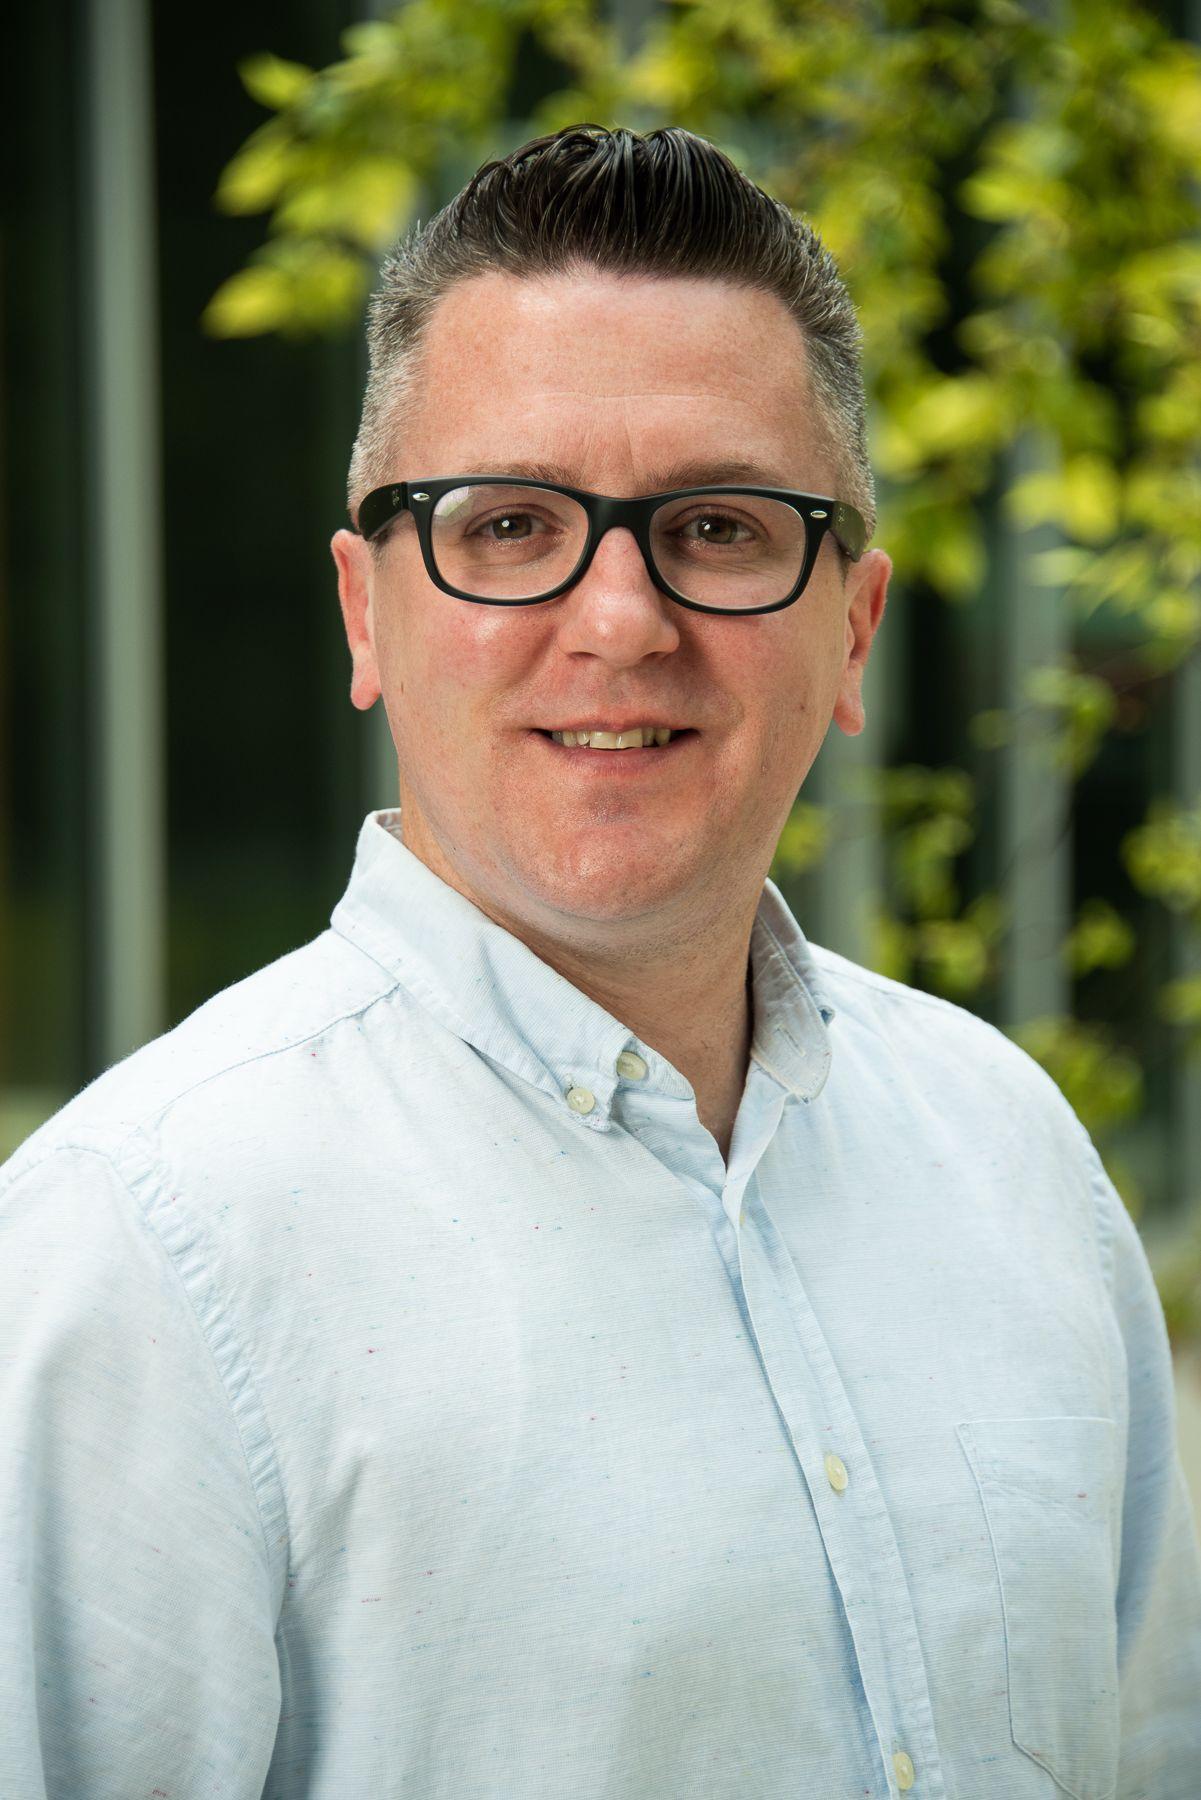 Michael Semrad